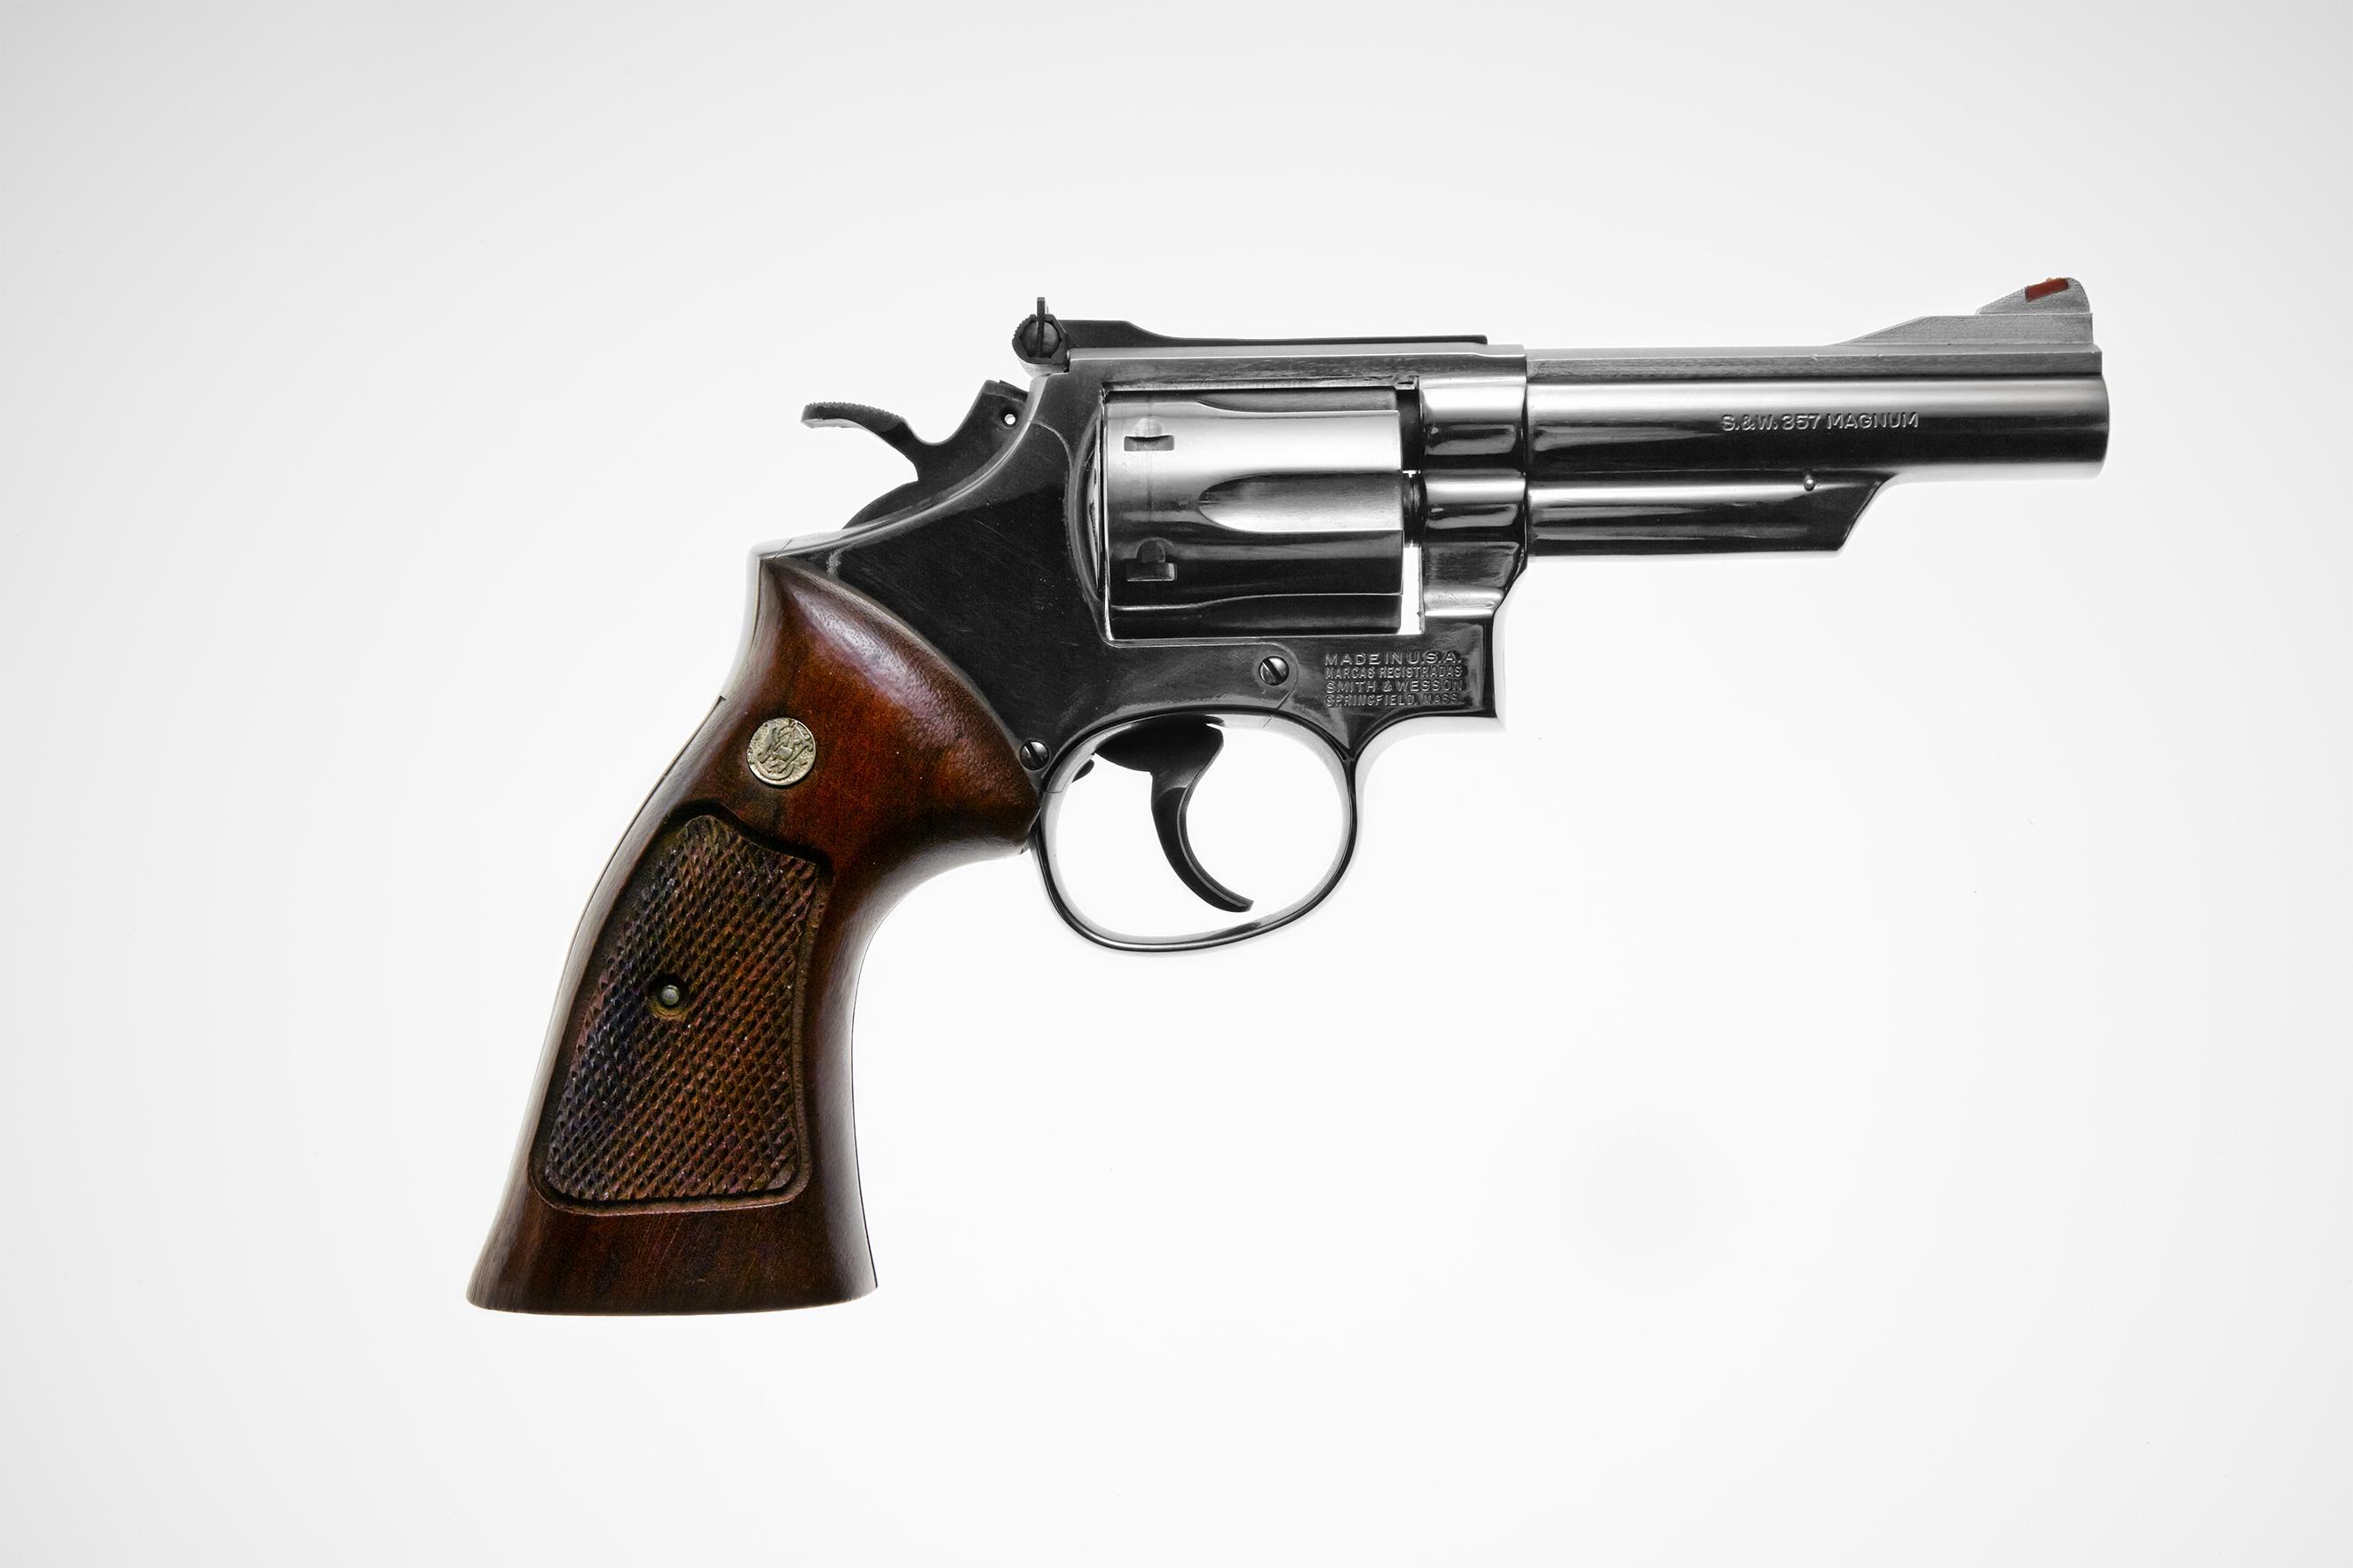 SW Revolver Sharper 50